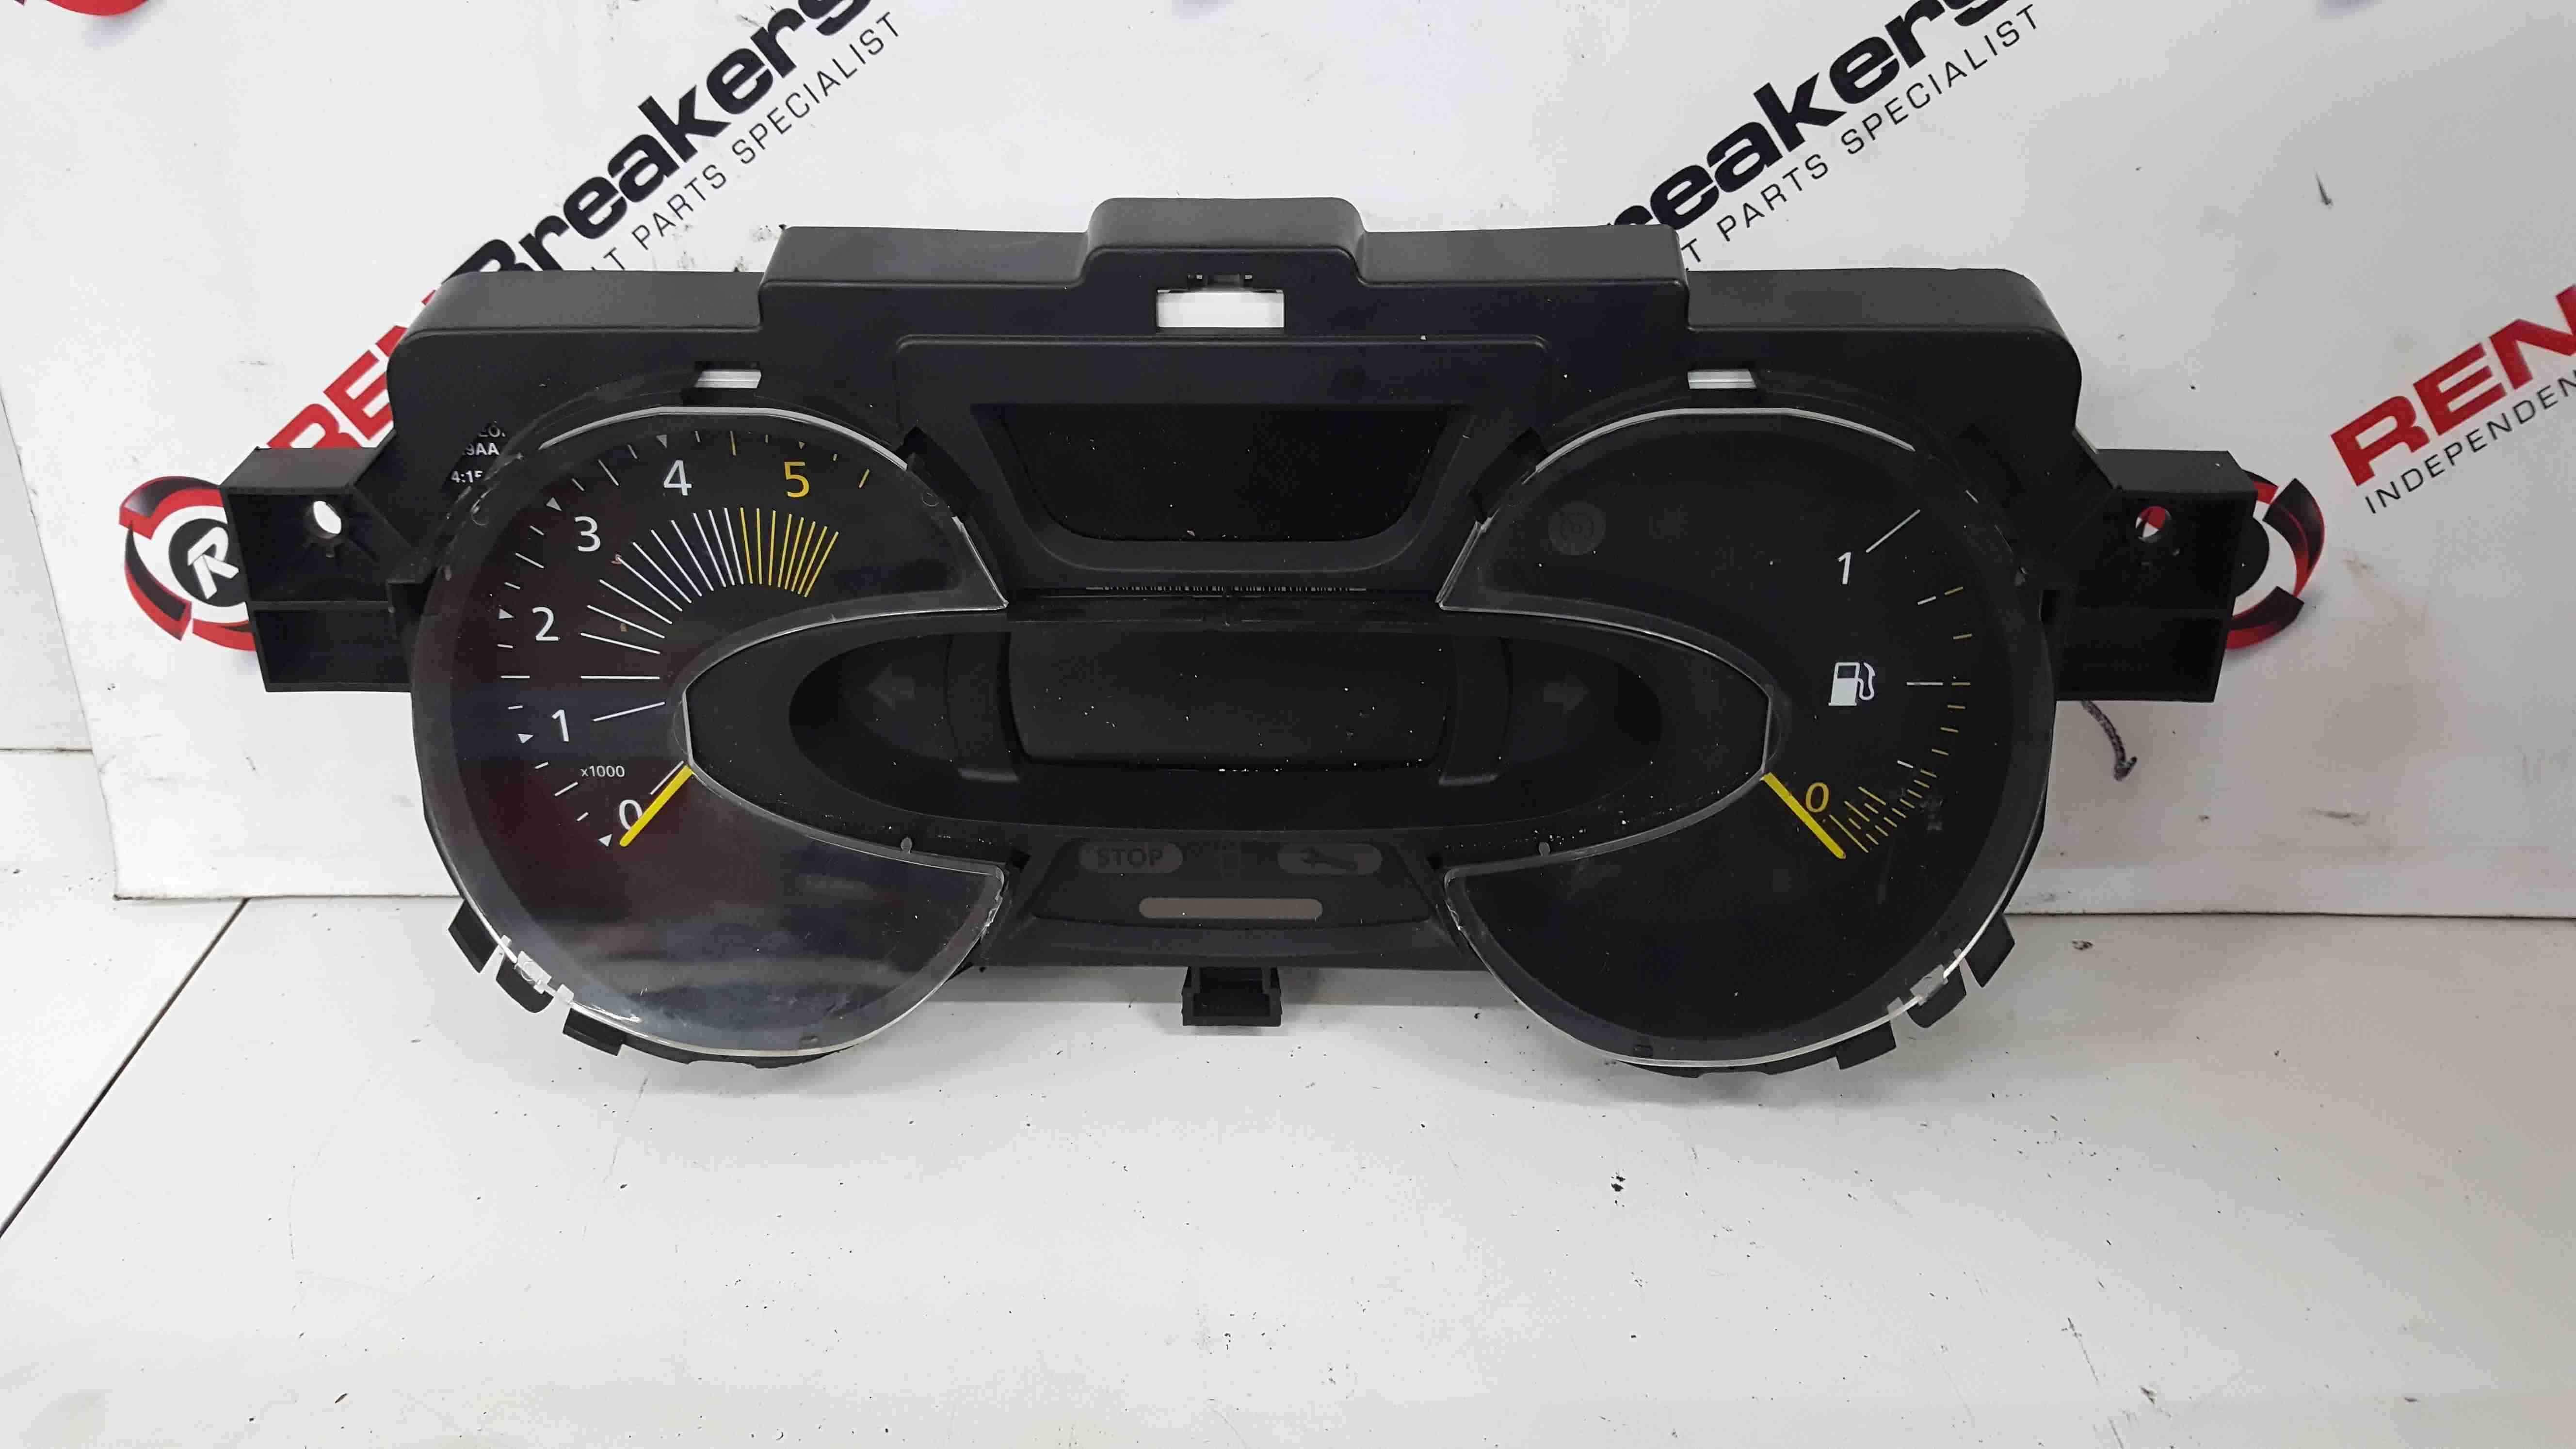 Renault Captur 2013-2019 Intrument Panel Dials Clocks Gauges 63K 248108011R